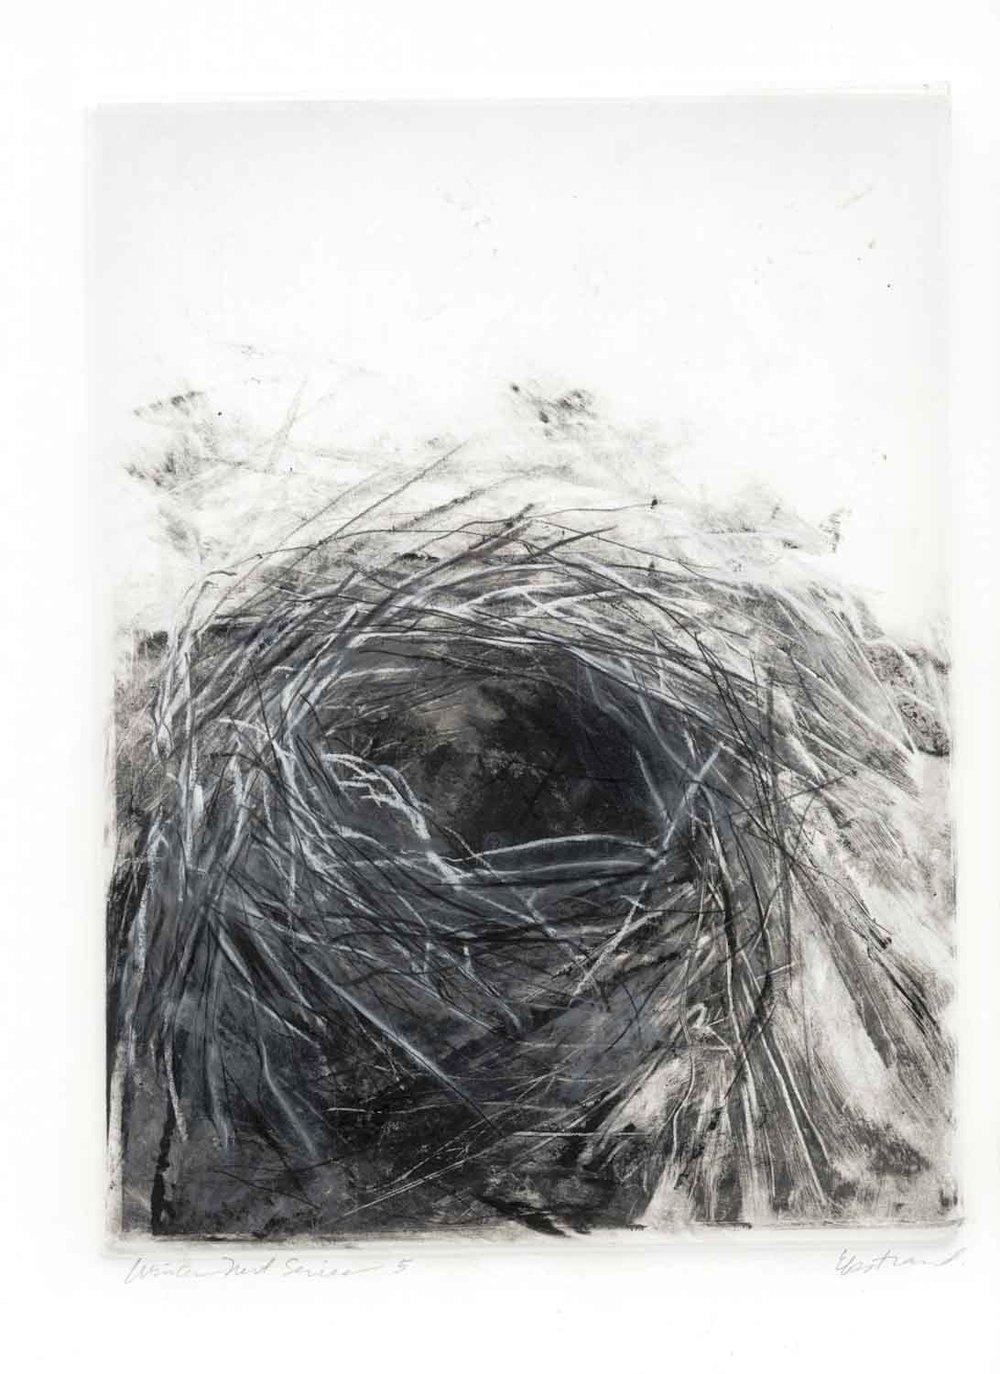 Winter Nest Series #5